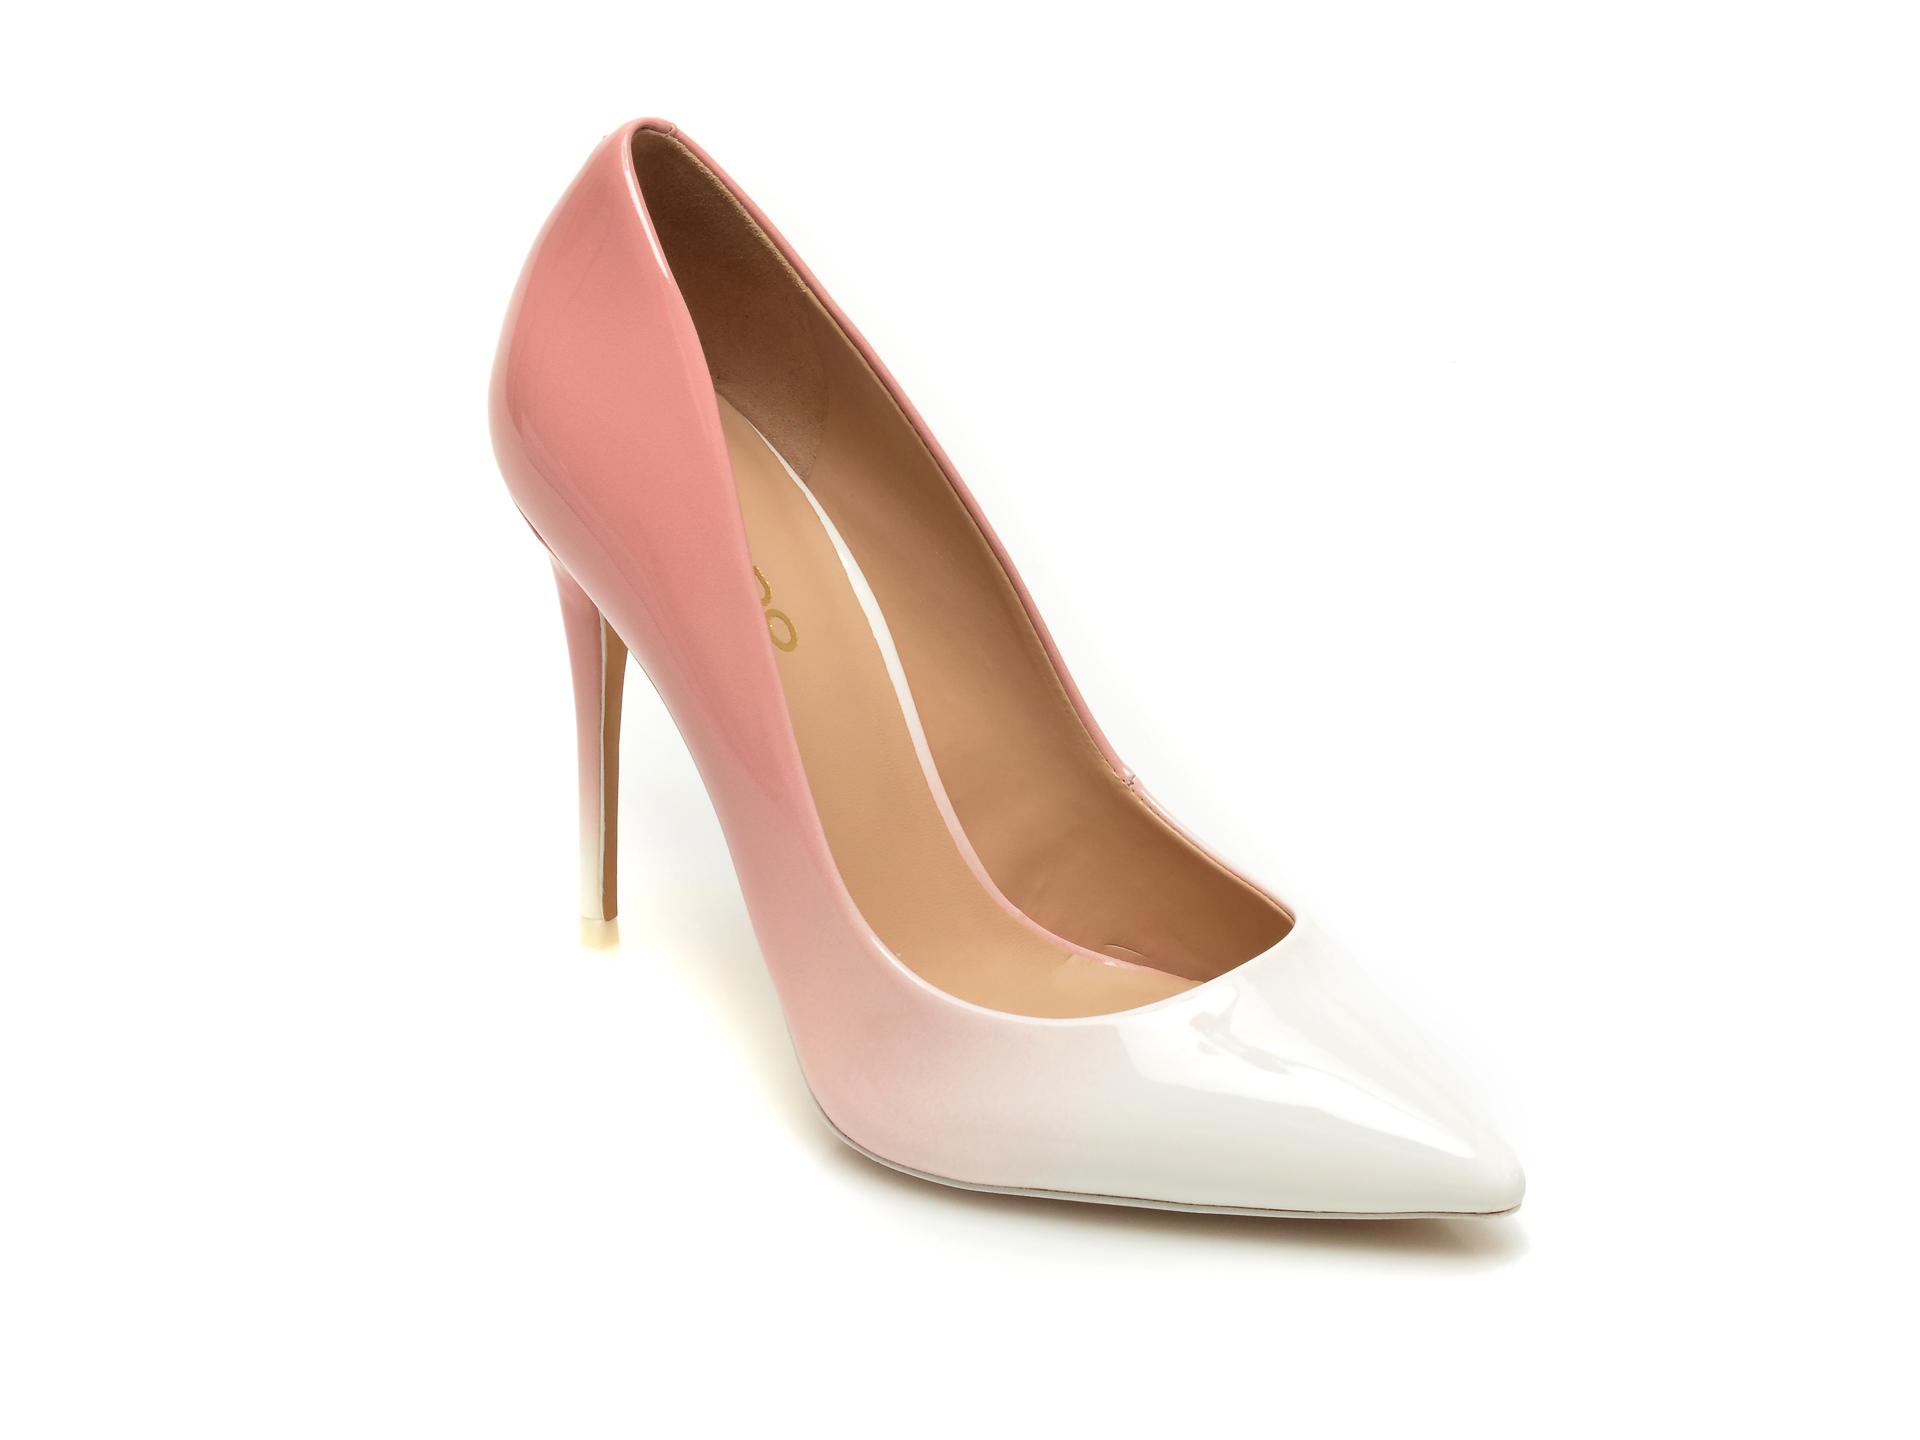 Pantofi ALDO roz, Stessy_650, din piele ecologica